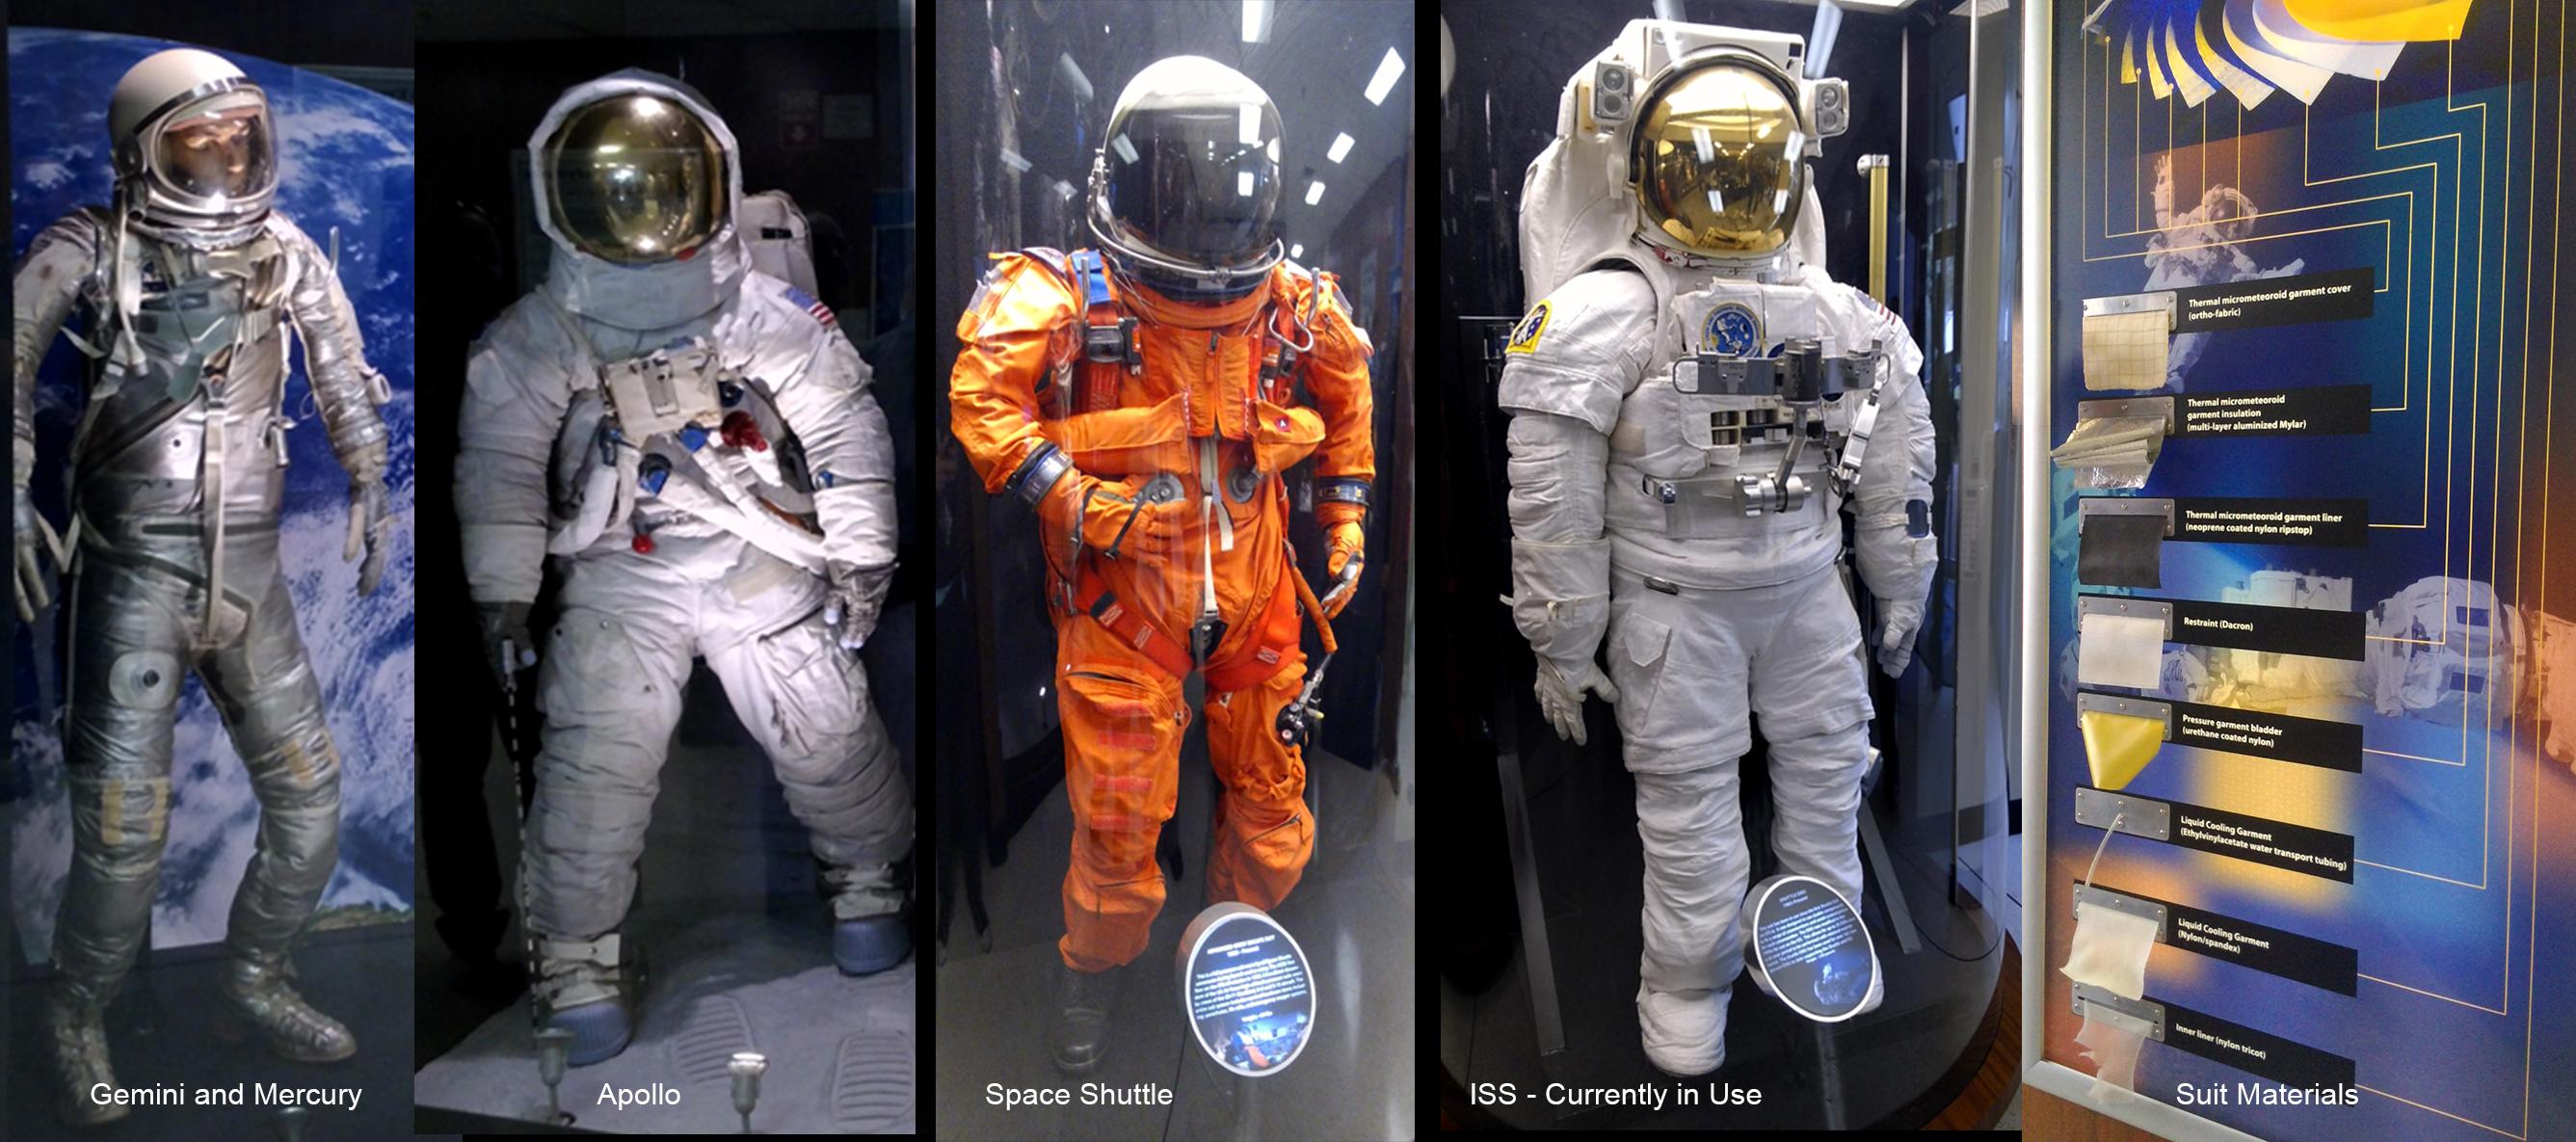 spacex evolution - photo #35